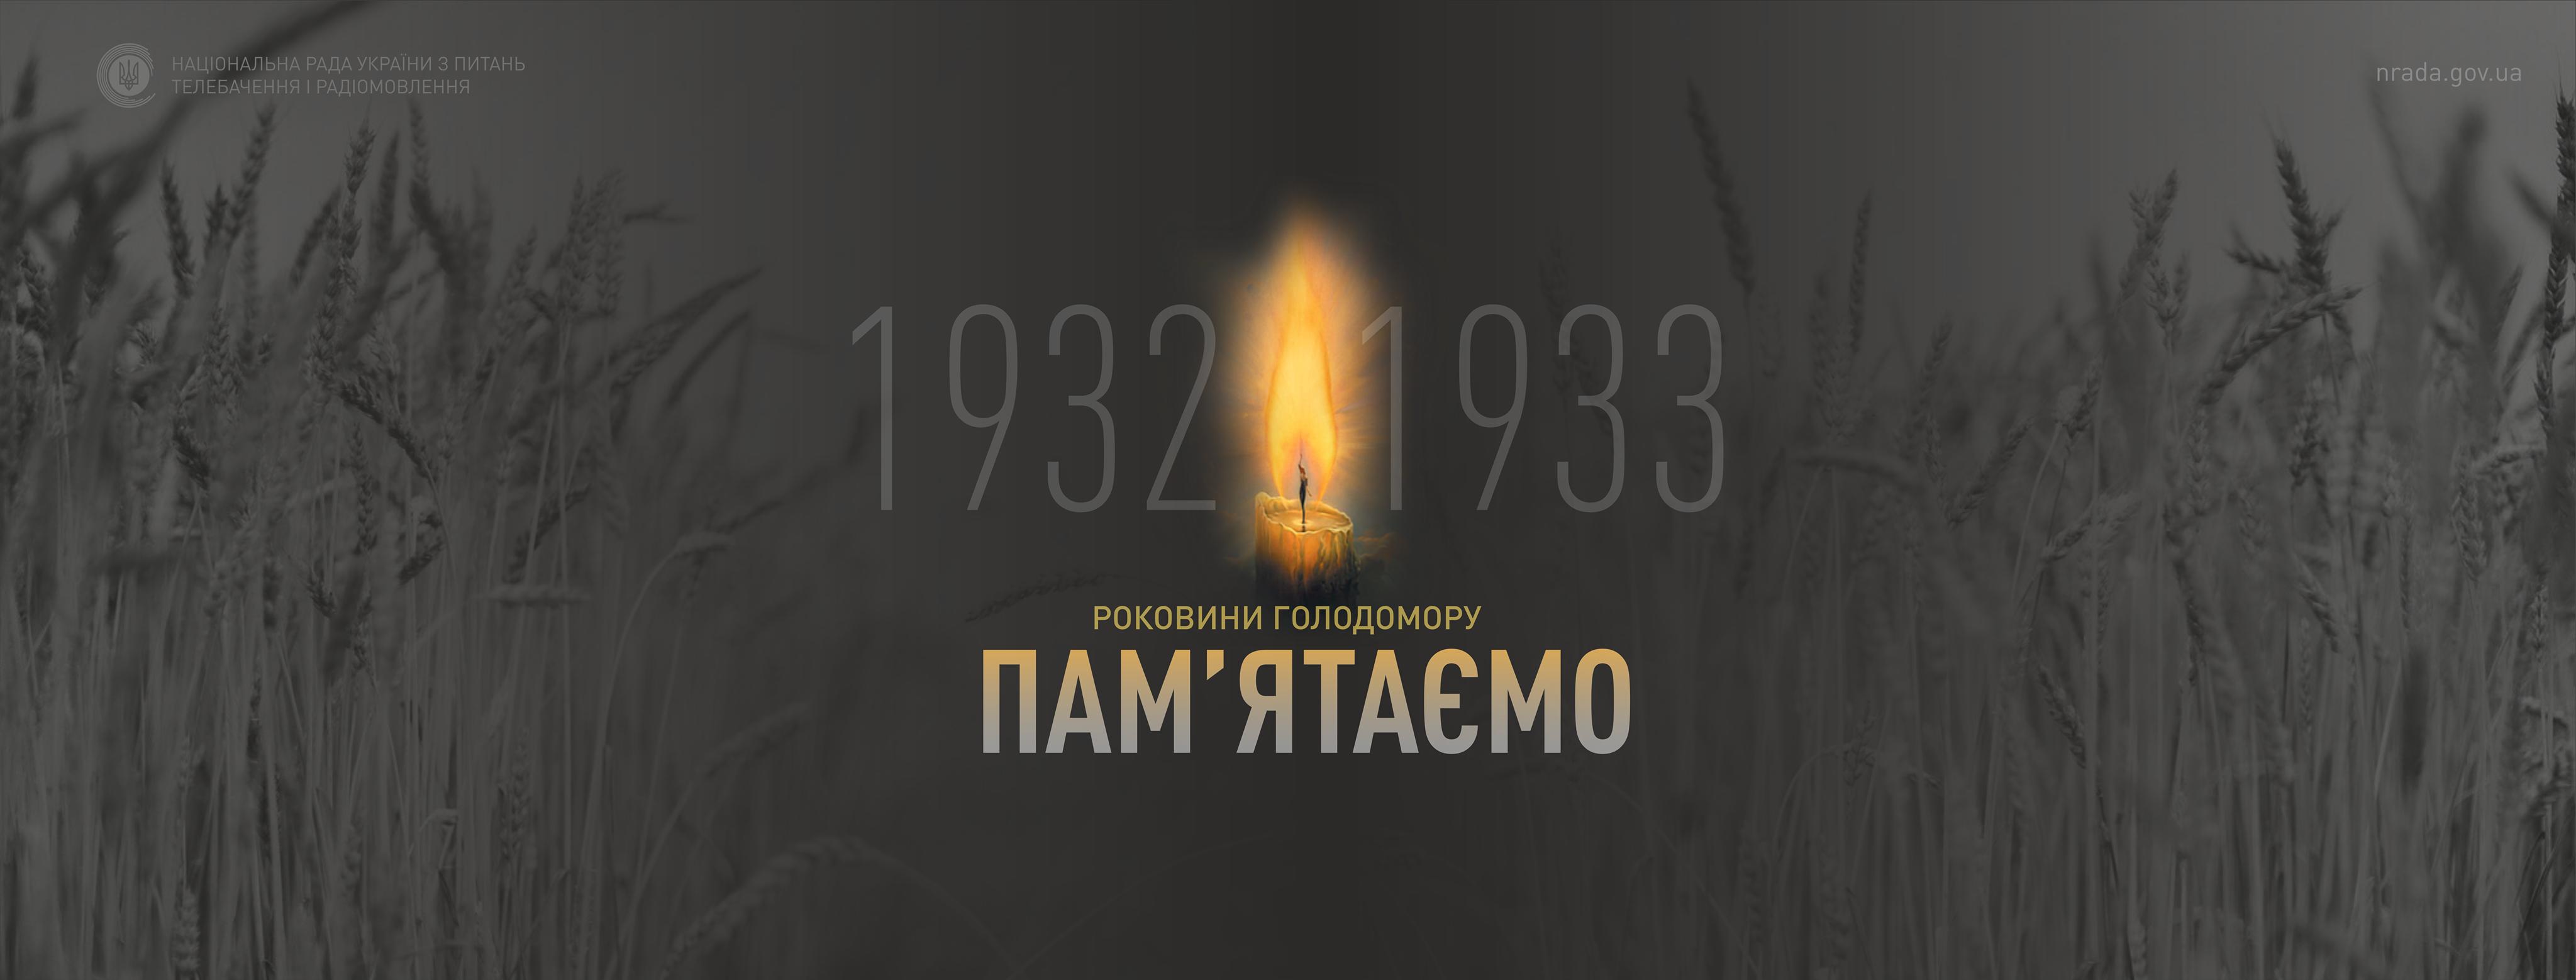 Картинки по запросу день пам'яті жертв голодомору 2019